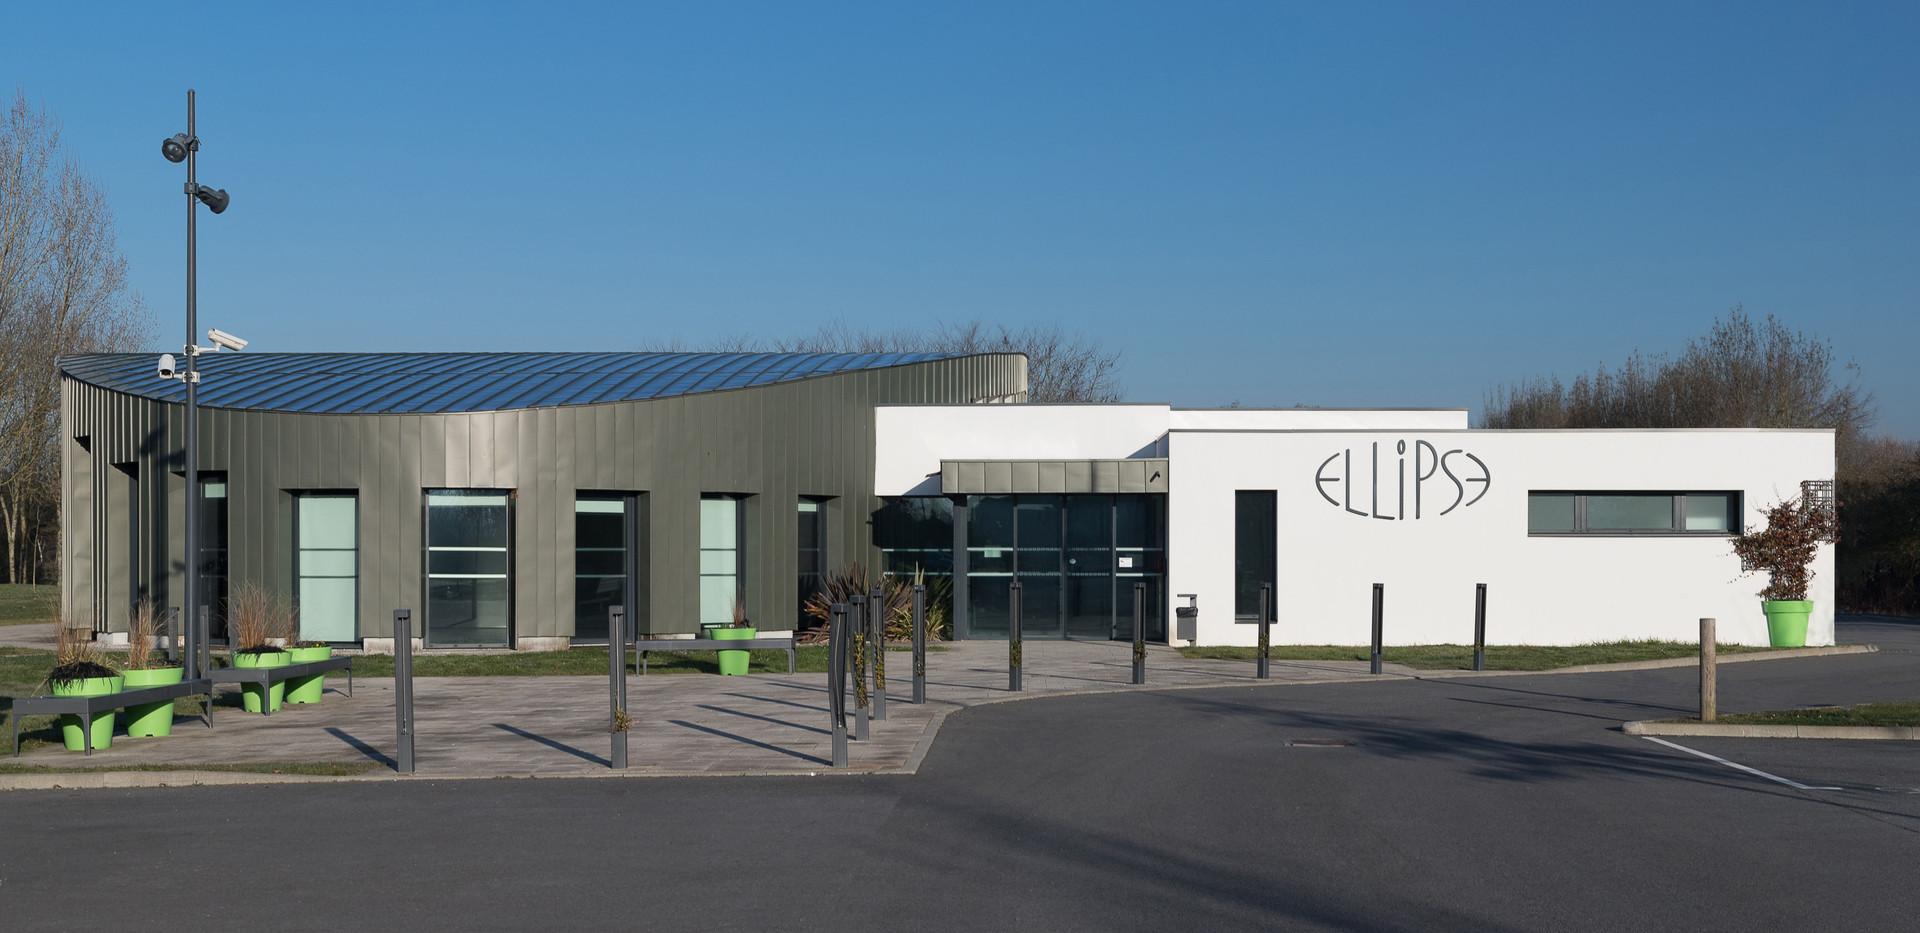 Ellipse Chaumes-4comp.jpg